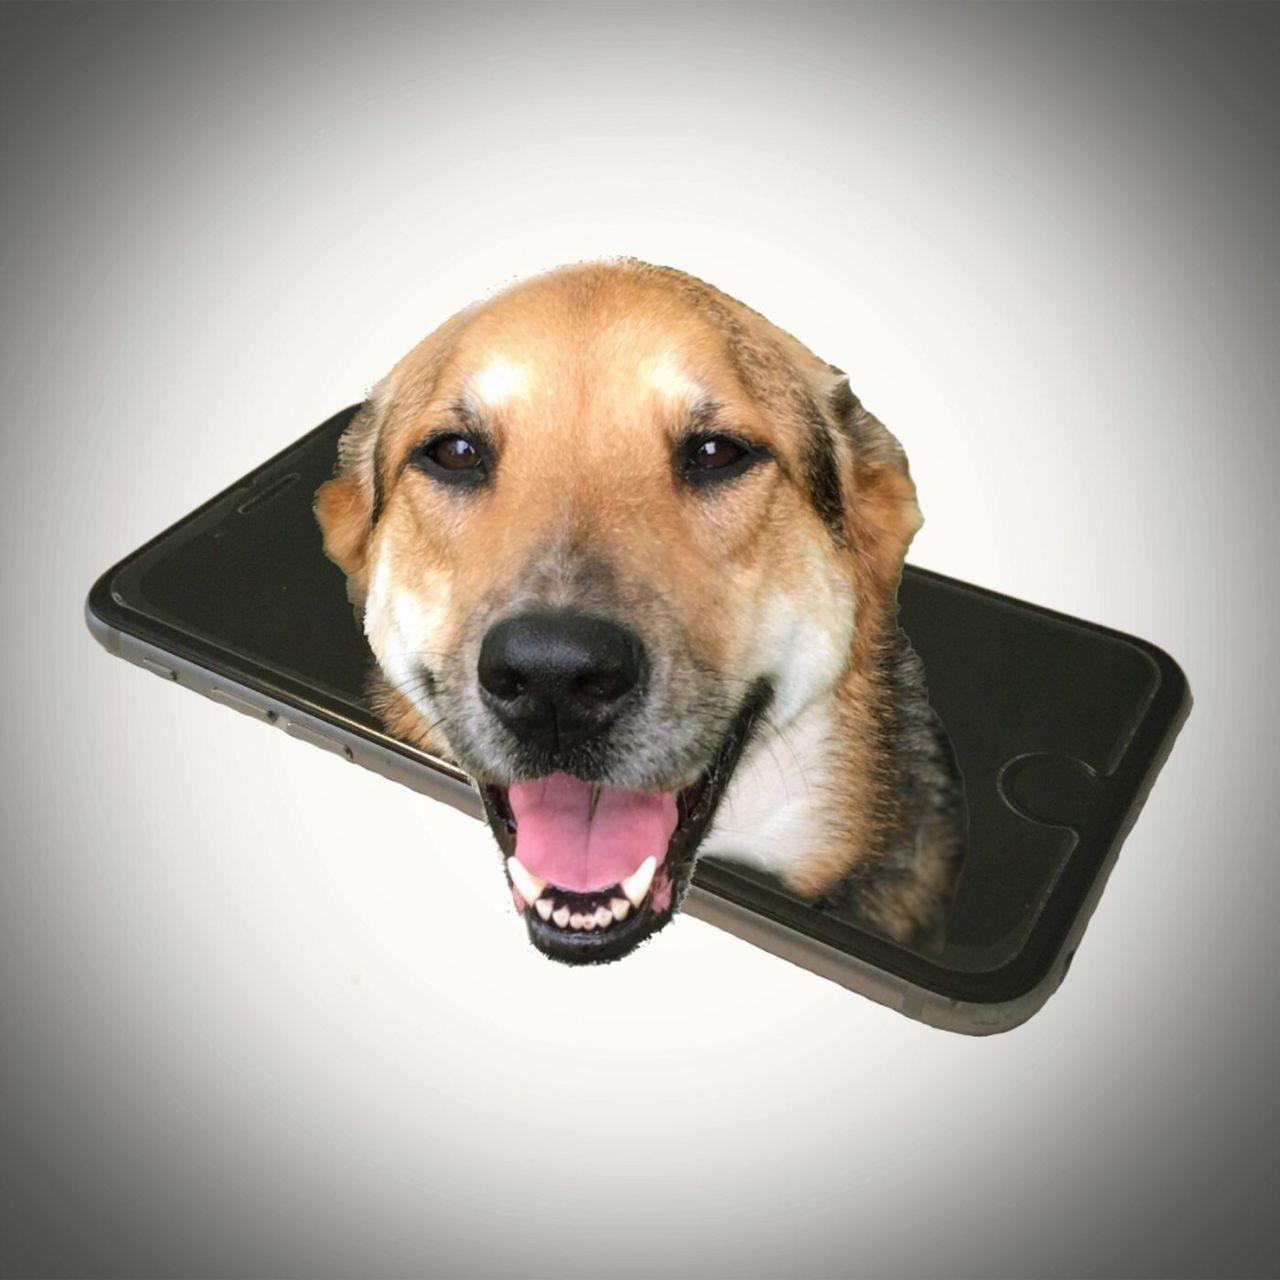 JoJo iPhone portrait #edited #Enlight #iPhone #Iphoneography #JohnGoldenne , #Dog